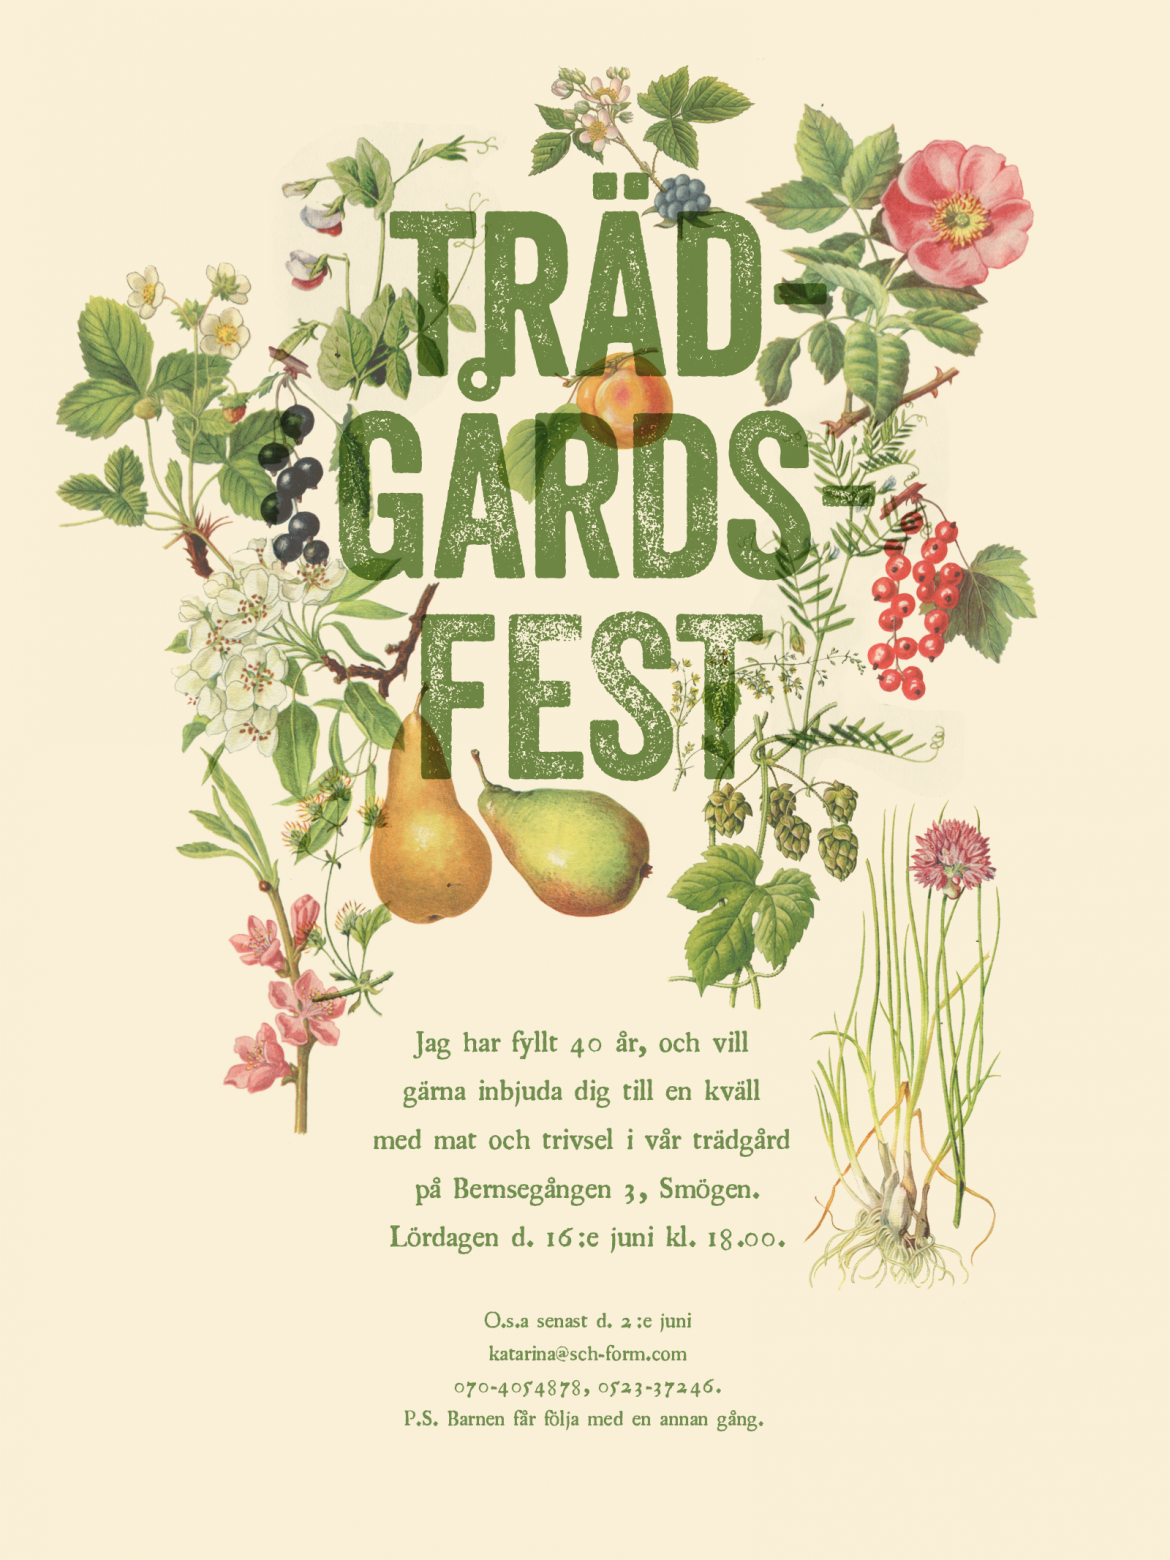 Tradgardsfest_1600